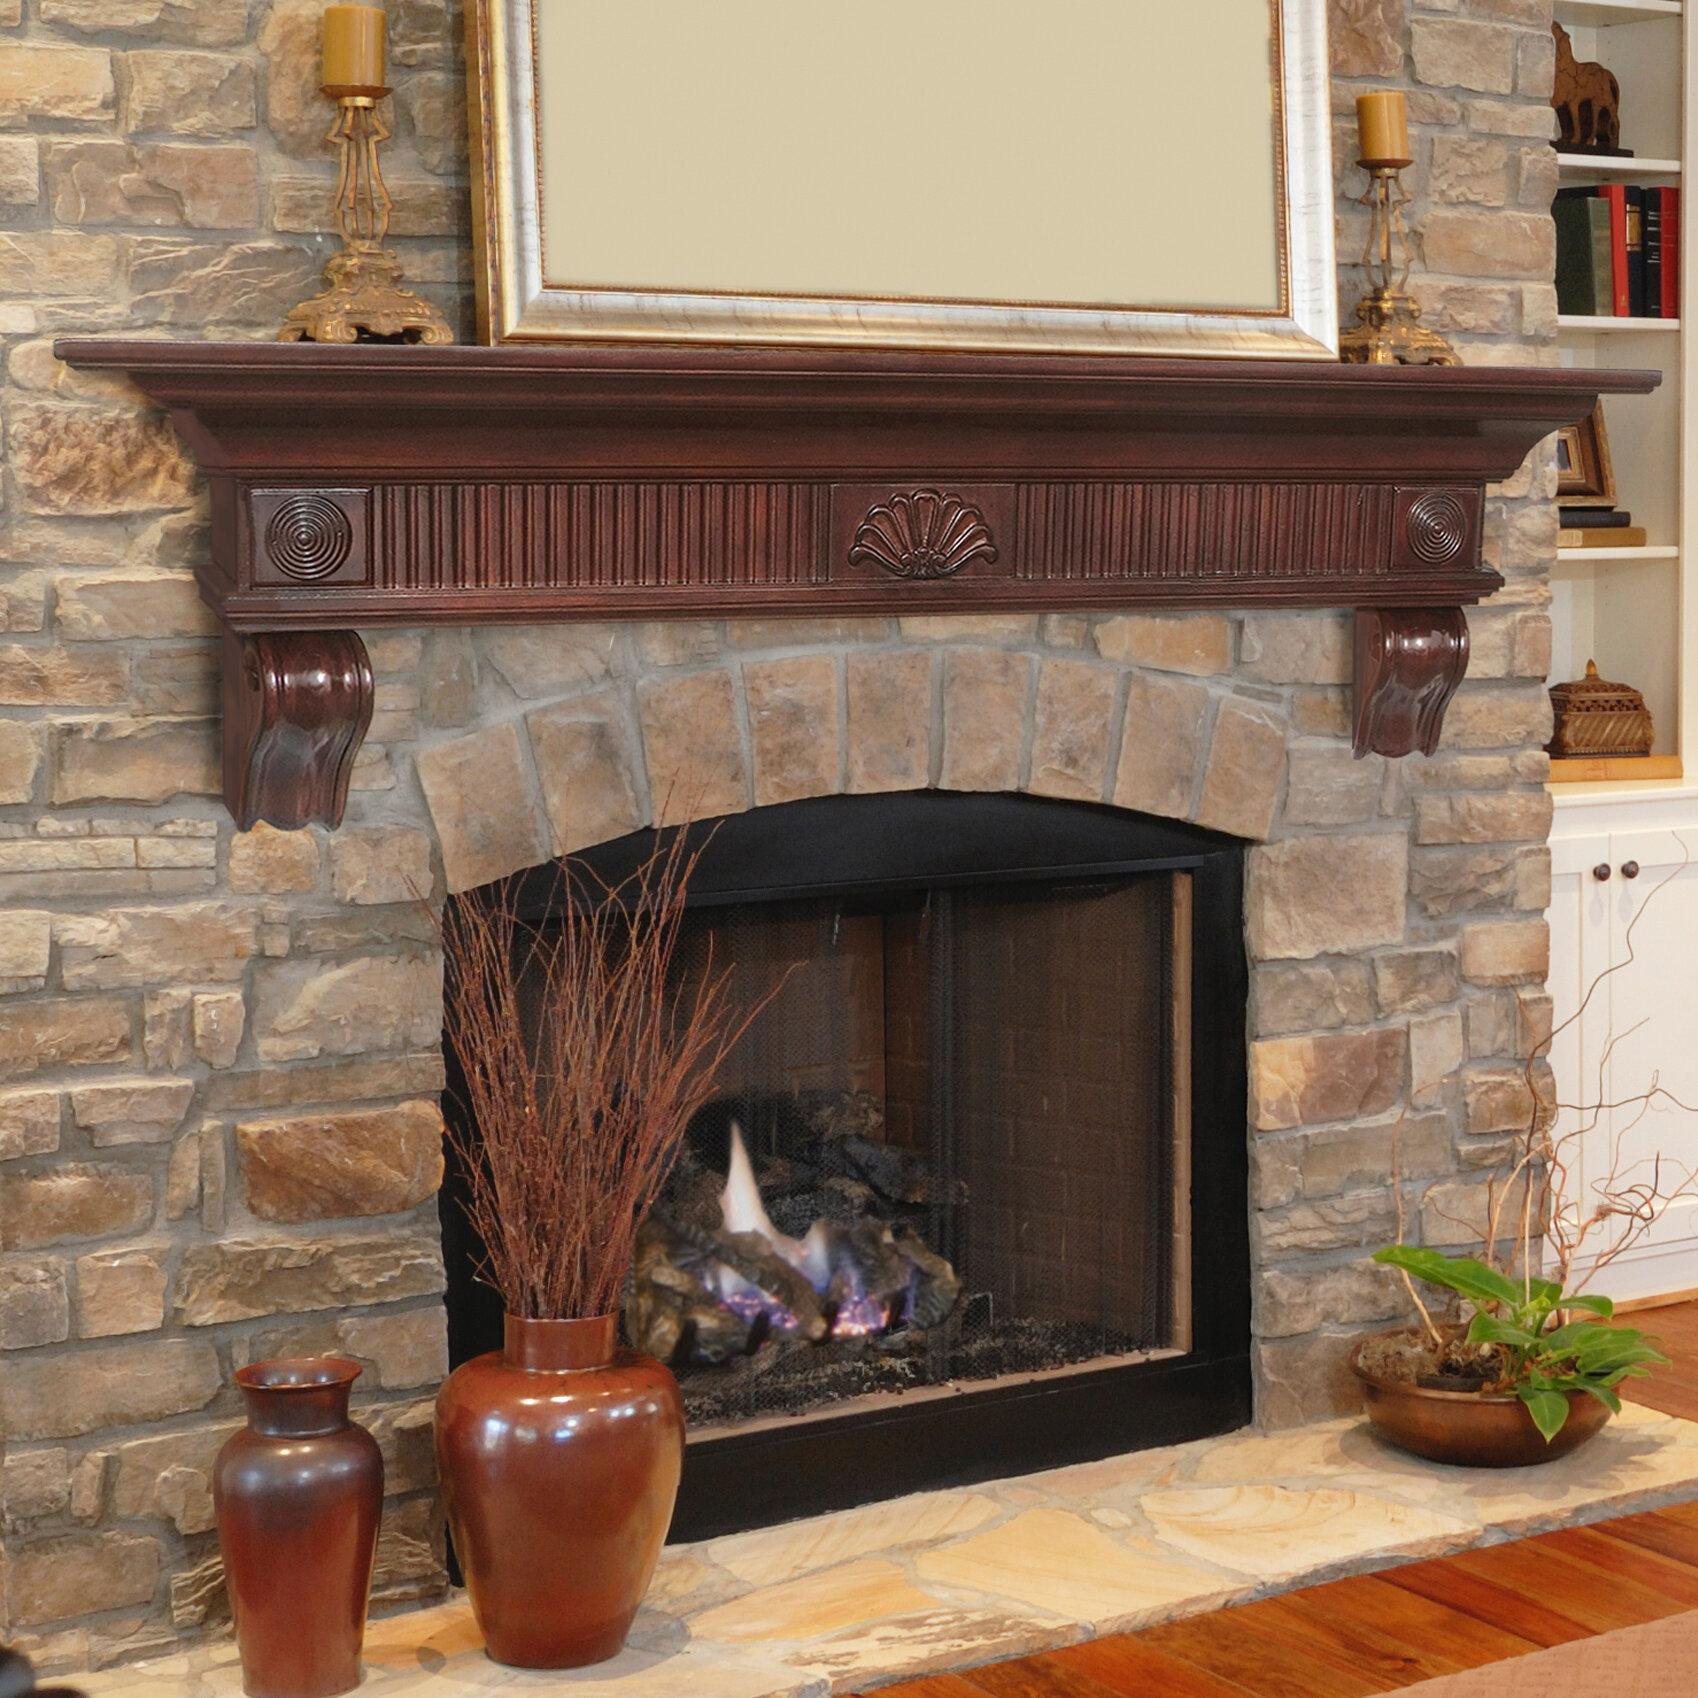 Swell The Devonshire Fireplace Shelf Mantel Home Interior And Landscaping Ponolsignezvosmurscom